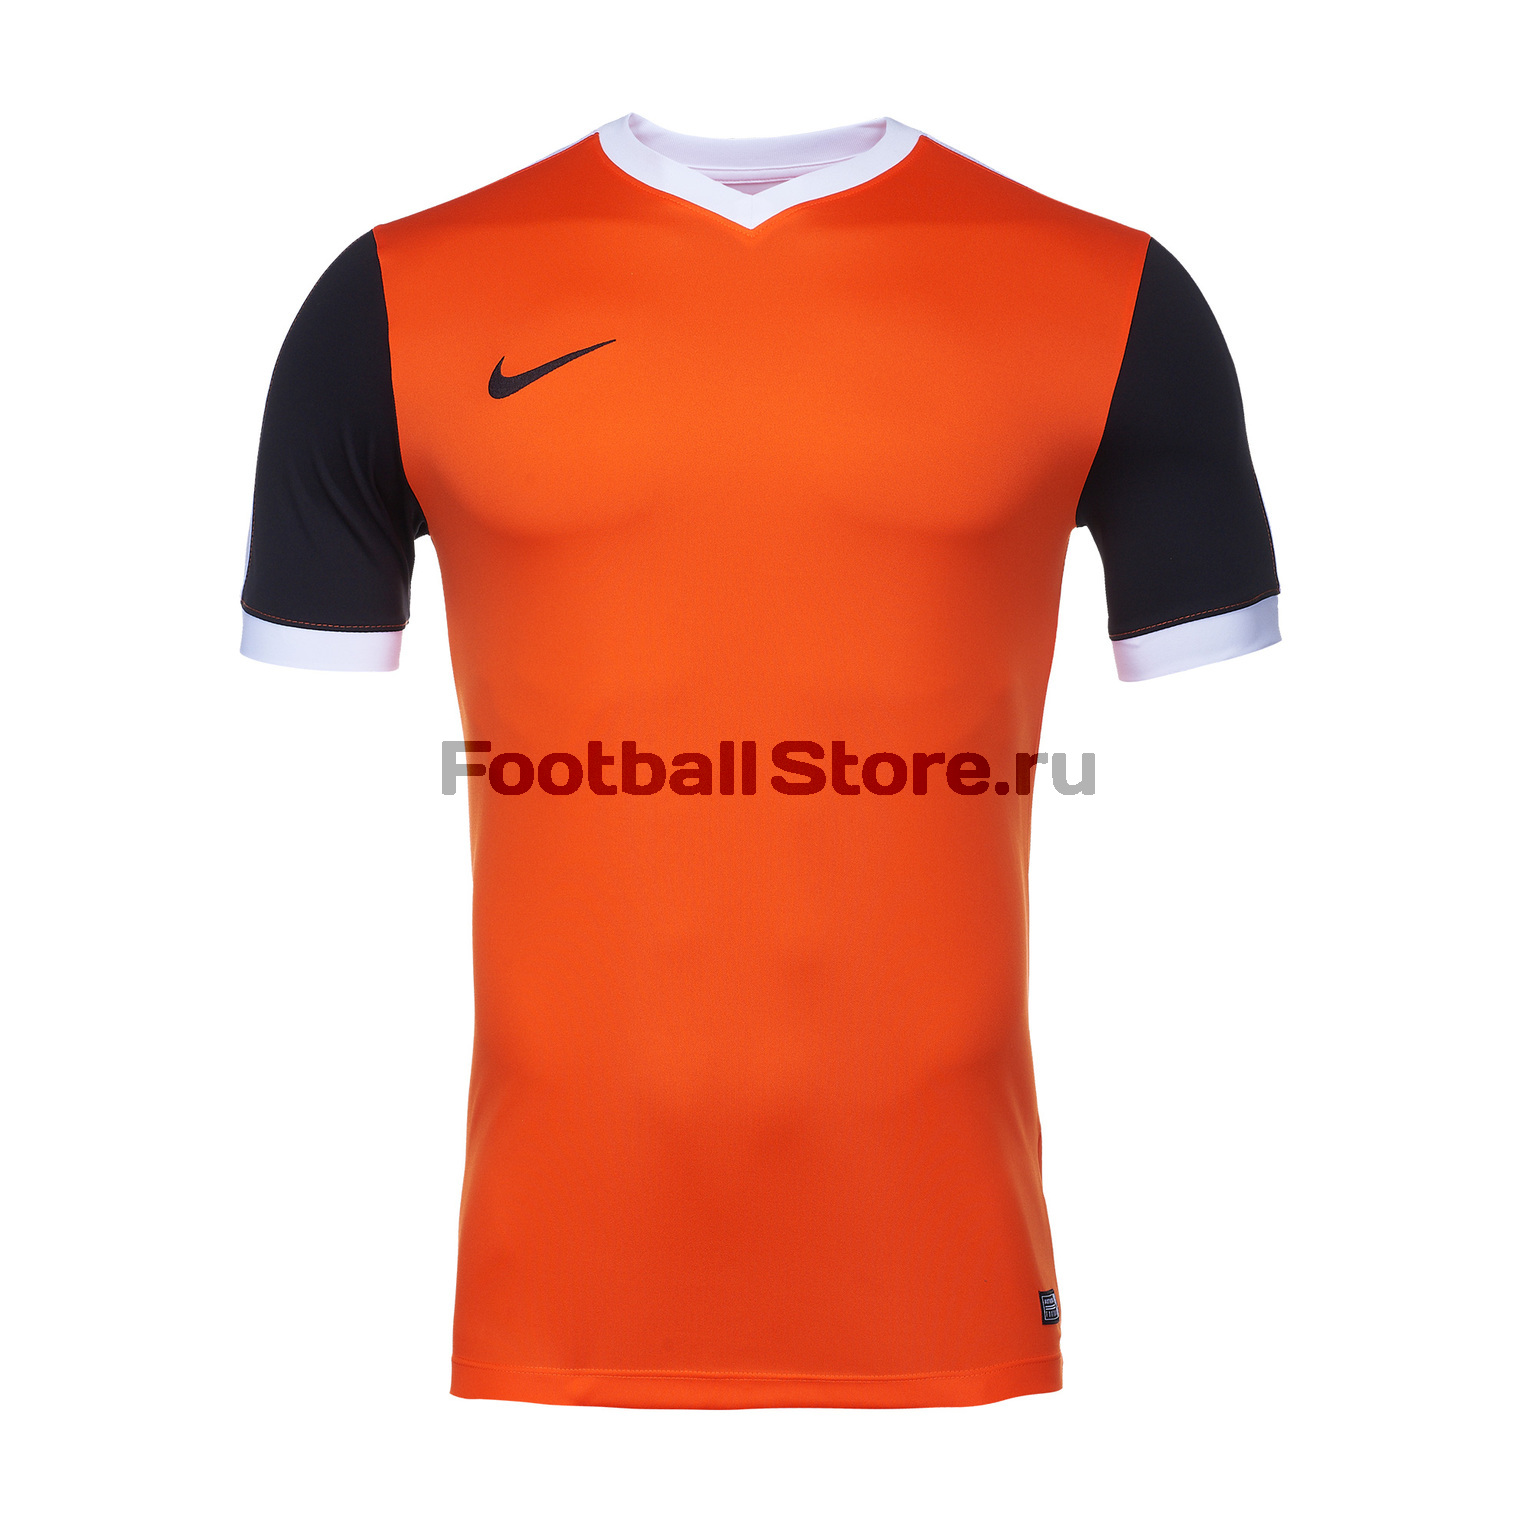 Футболки Nike Футболка Nike SS Striker IV JSY 725892-815 футболки nike футболка nike ss striker iv jsy 725892 815